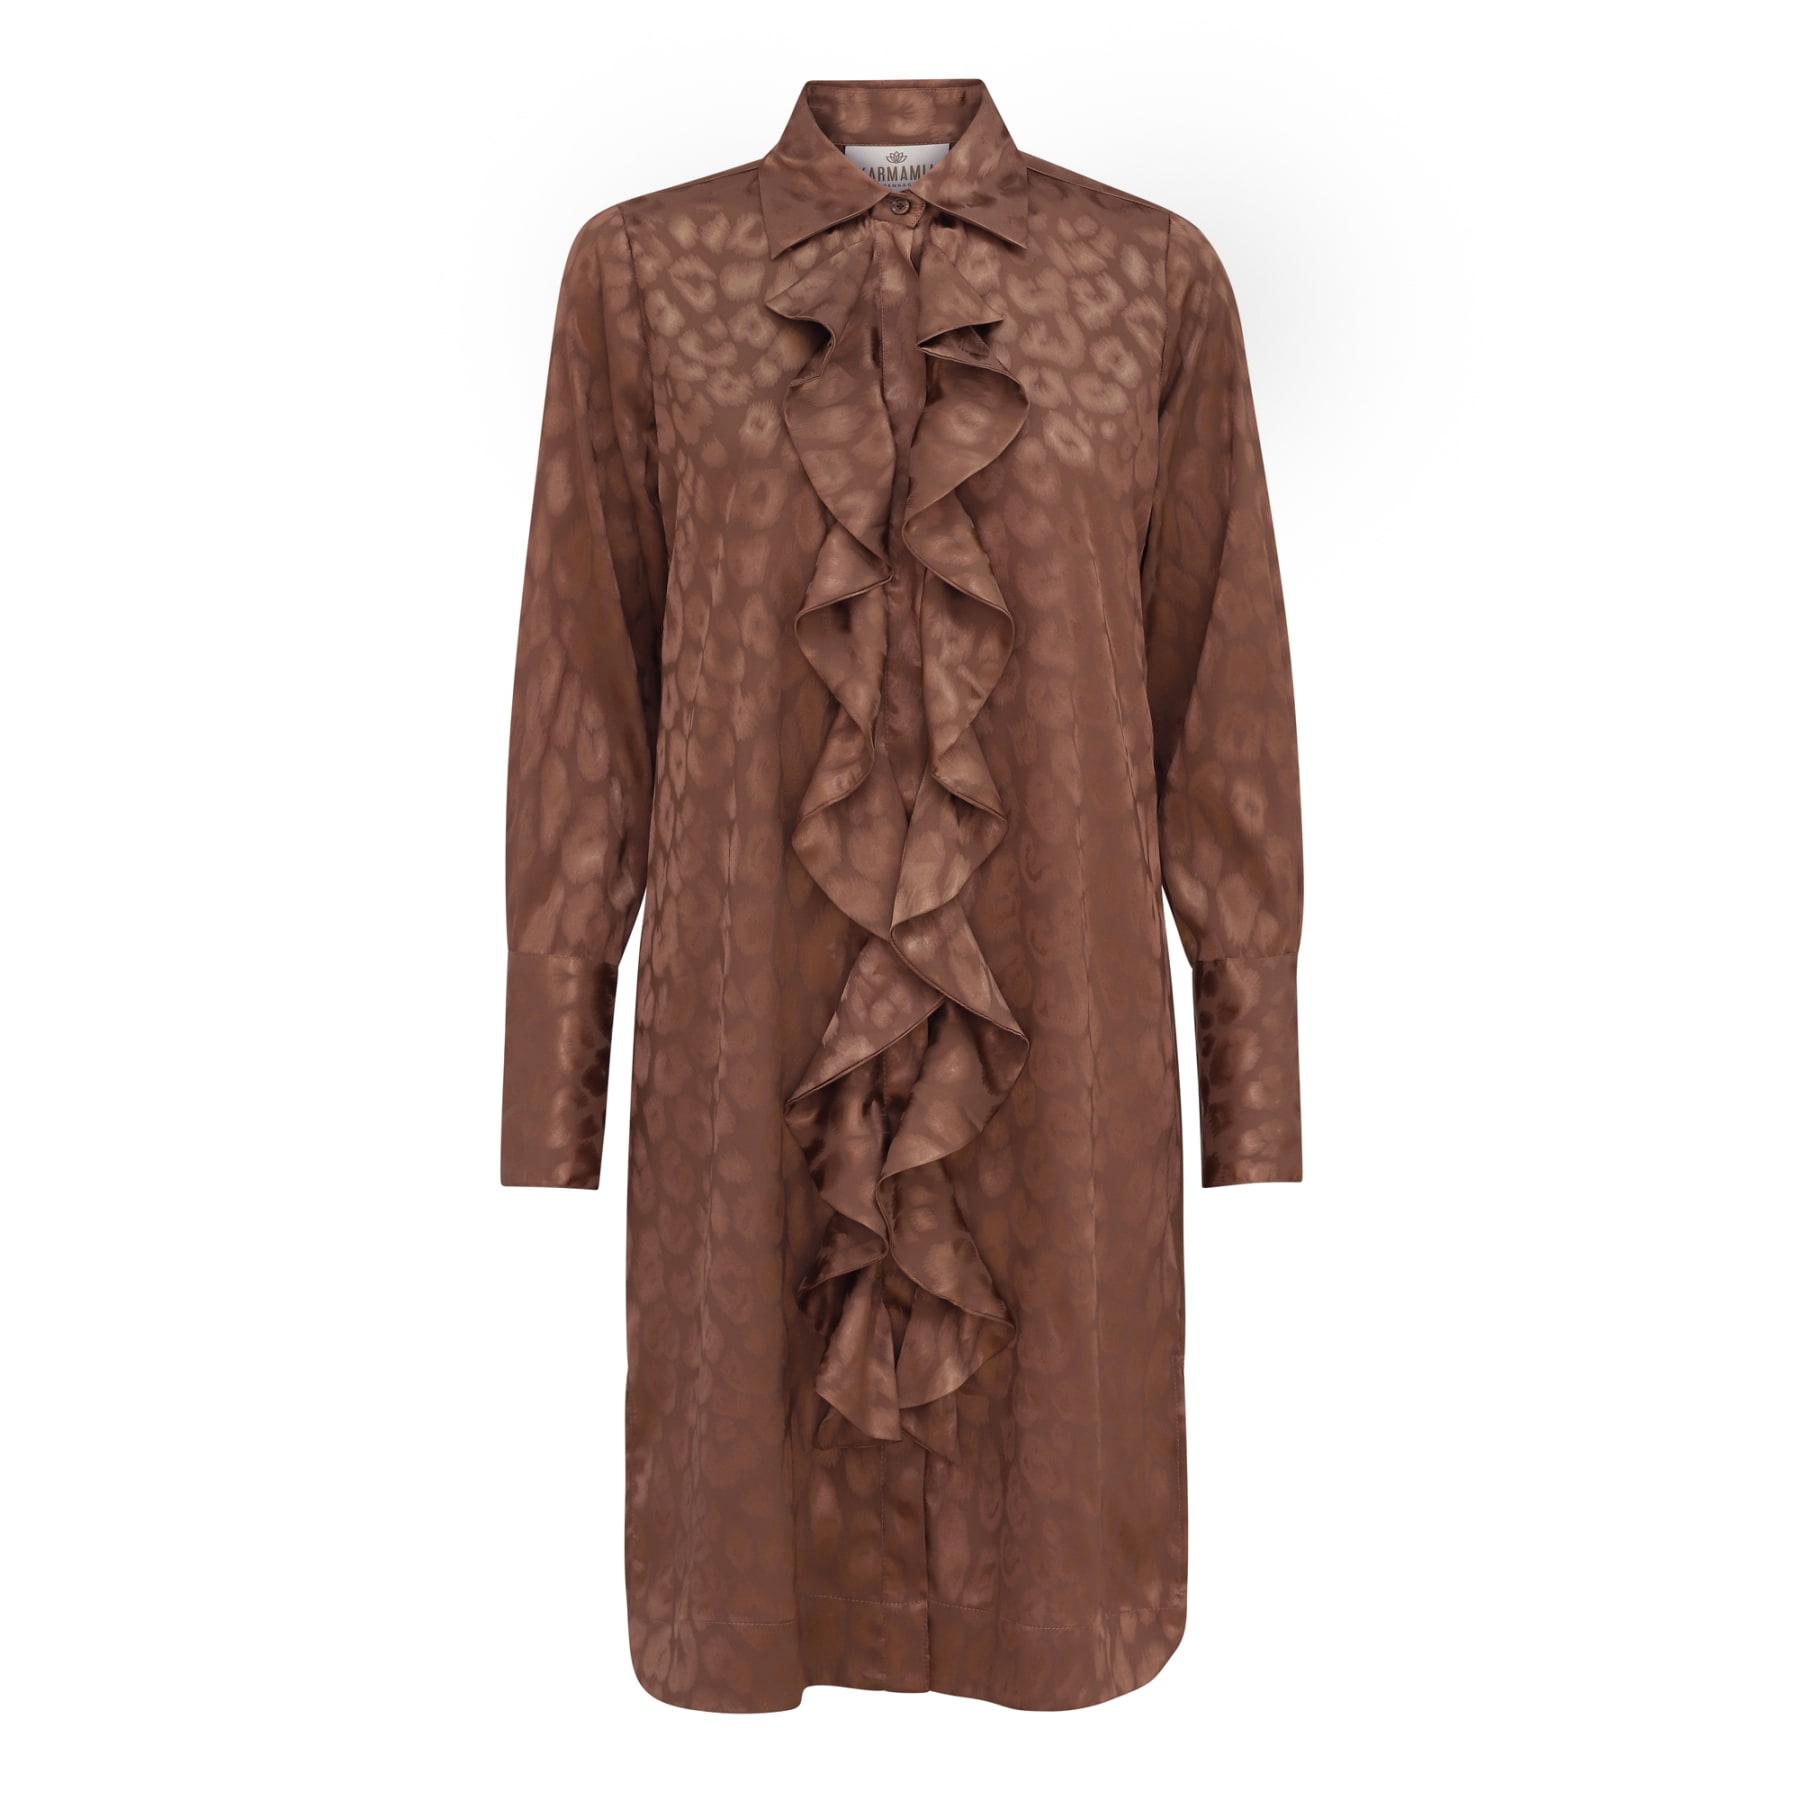 Ruffle Kimono (short) - Bronze Leo Jacquard KARMAMIA IMAGE BY ME